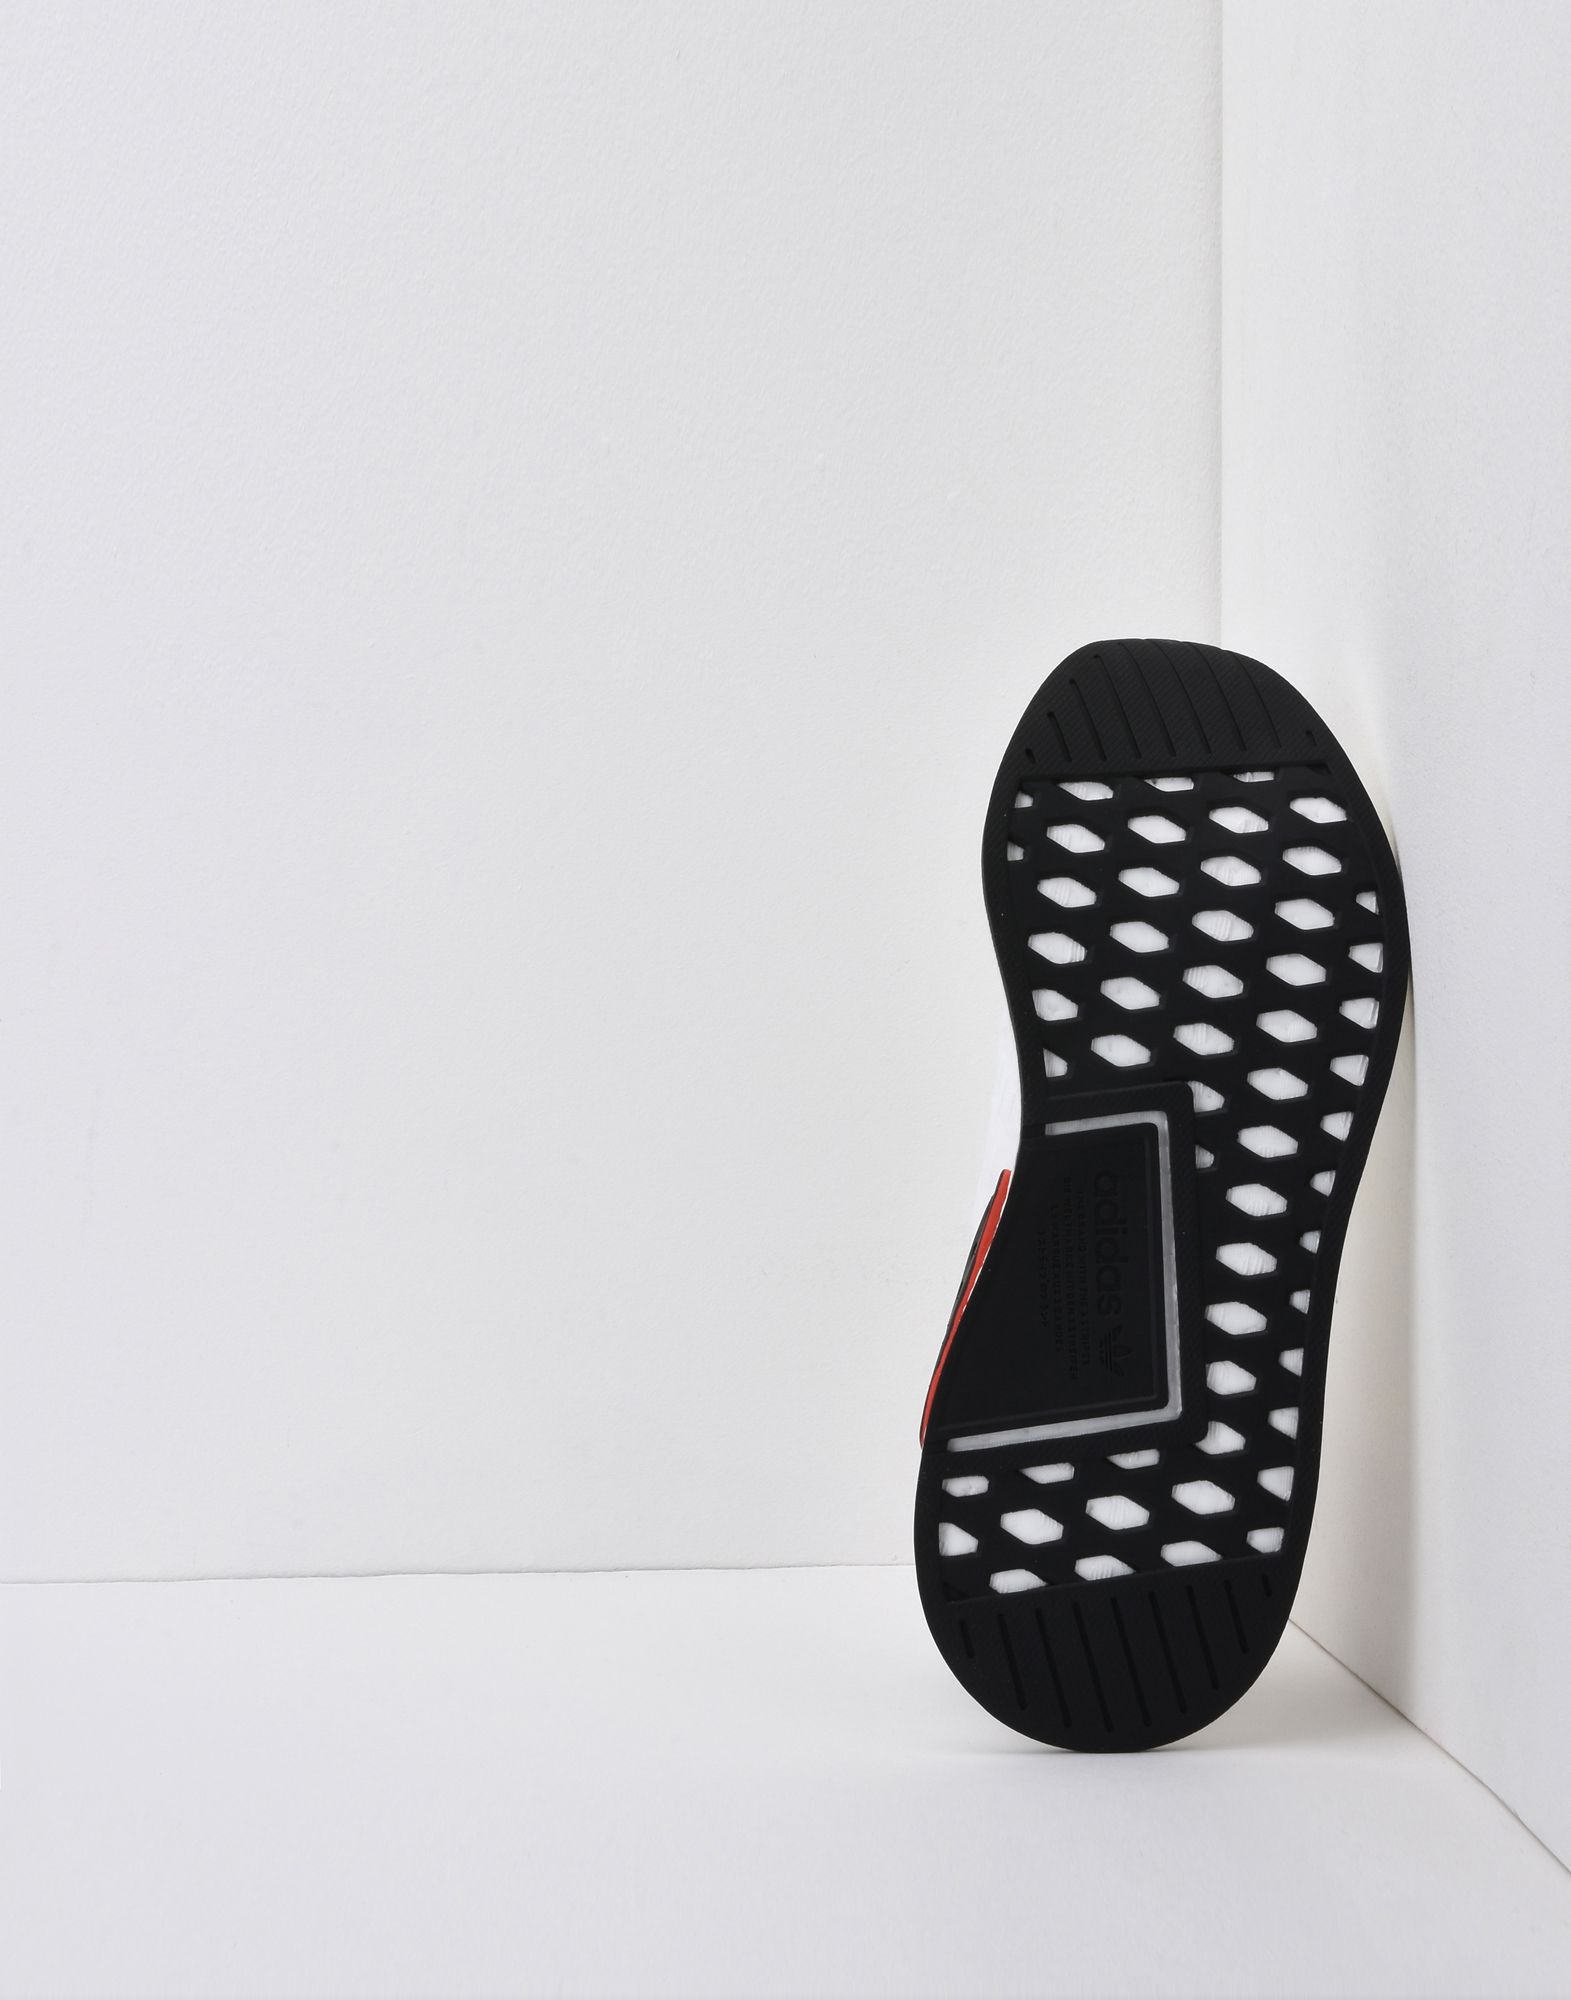 Adidas Originals Nmd_R2 aussehende Pk  11371797WVGut aussehende Nmd_R2 strapazierfähige Schuhe f8e71f